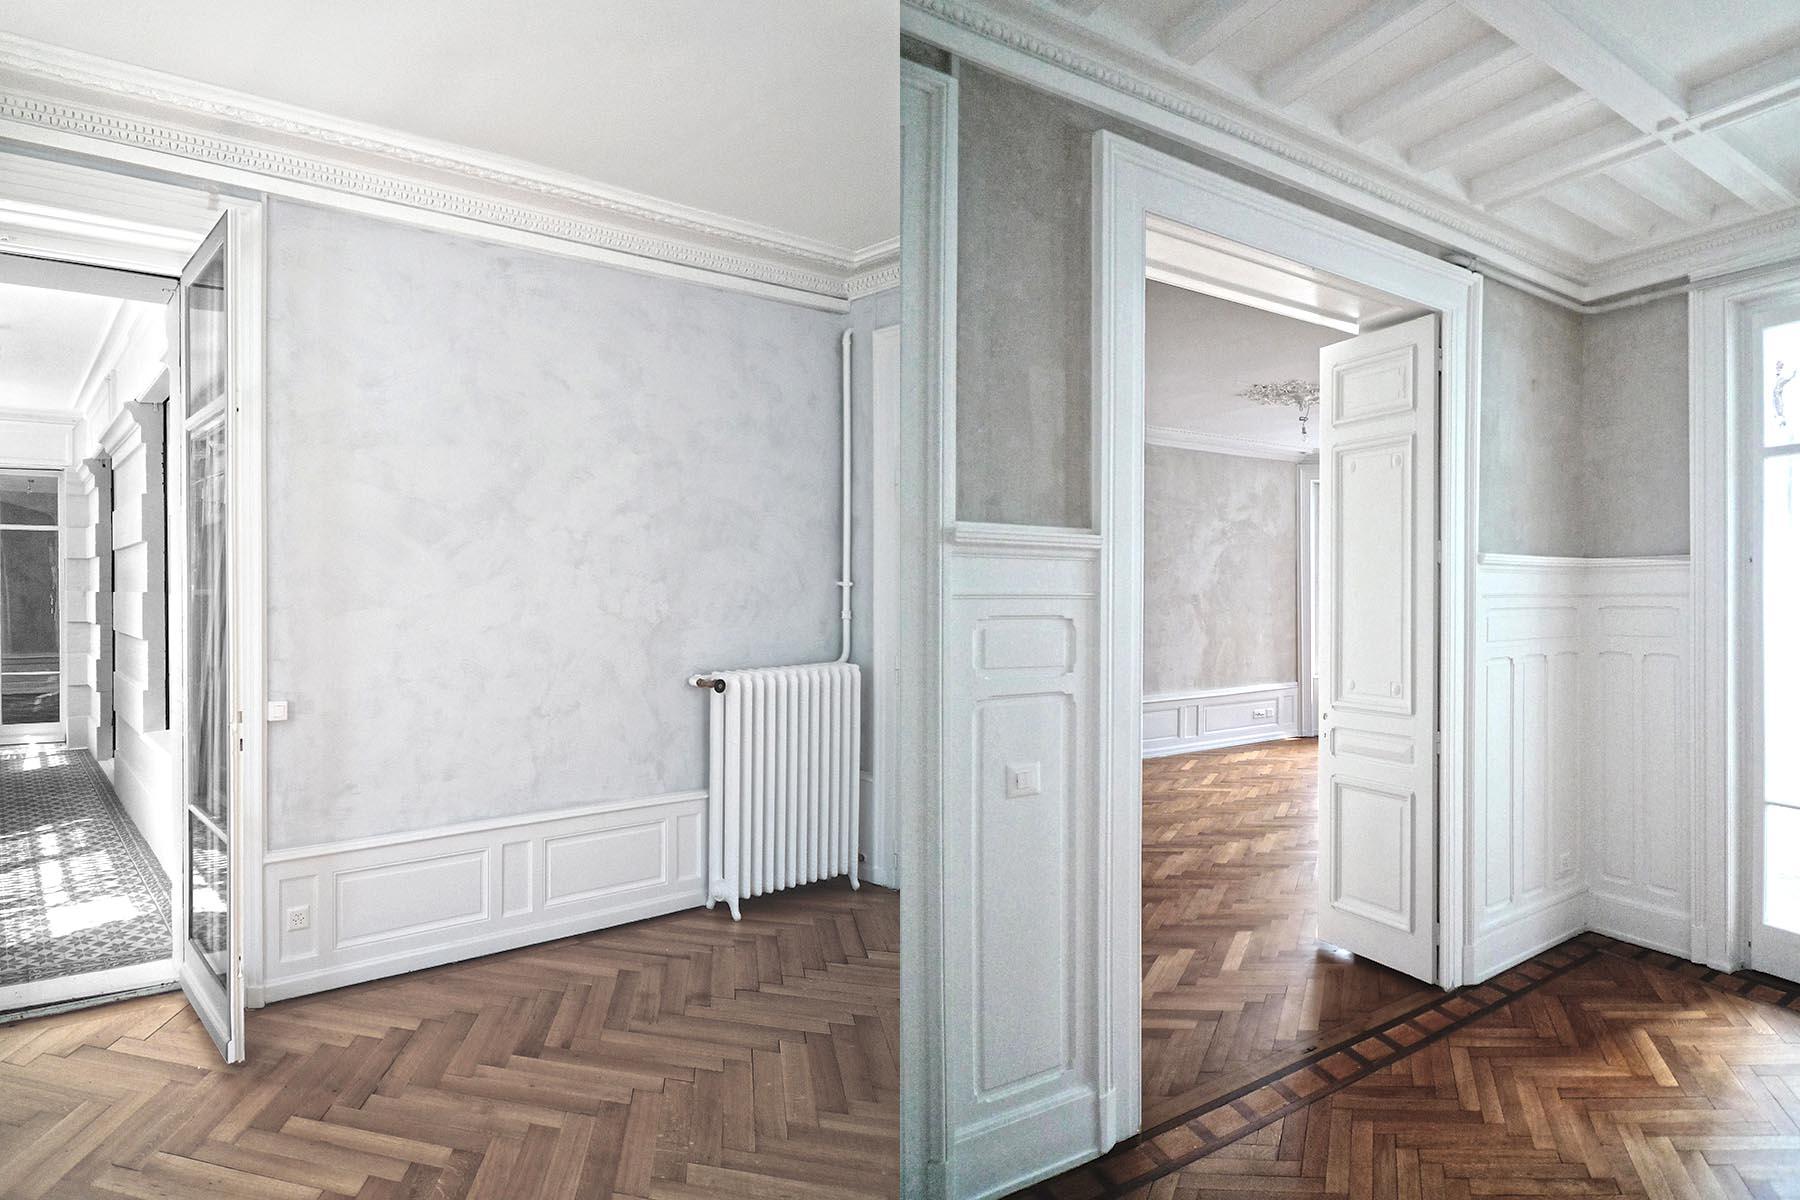 Genève / Geneva, Transformation d'appartement / Flat refurbishment, Burrus Nussbaumer Architectes